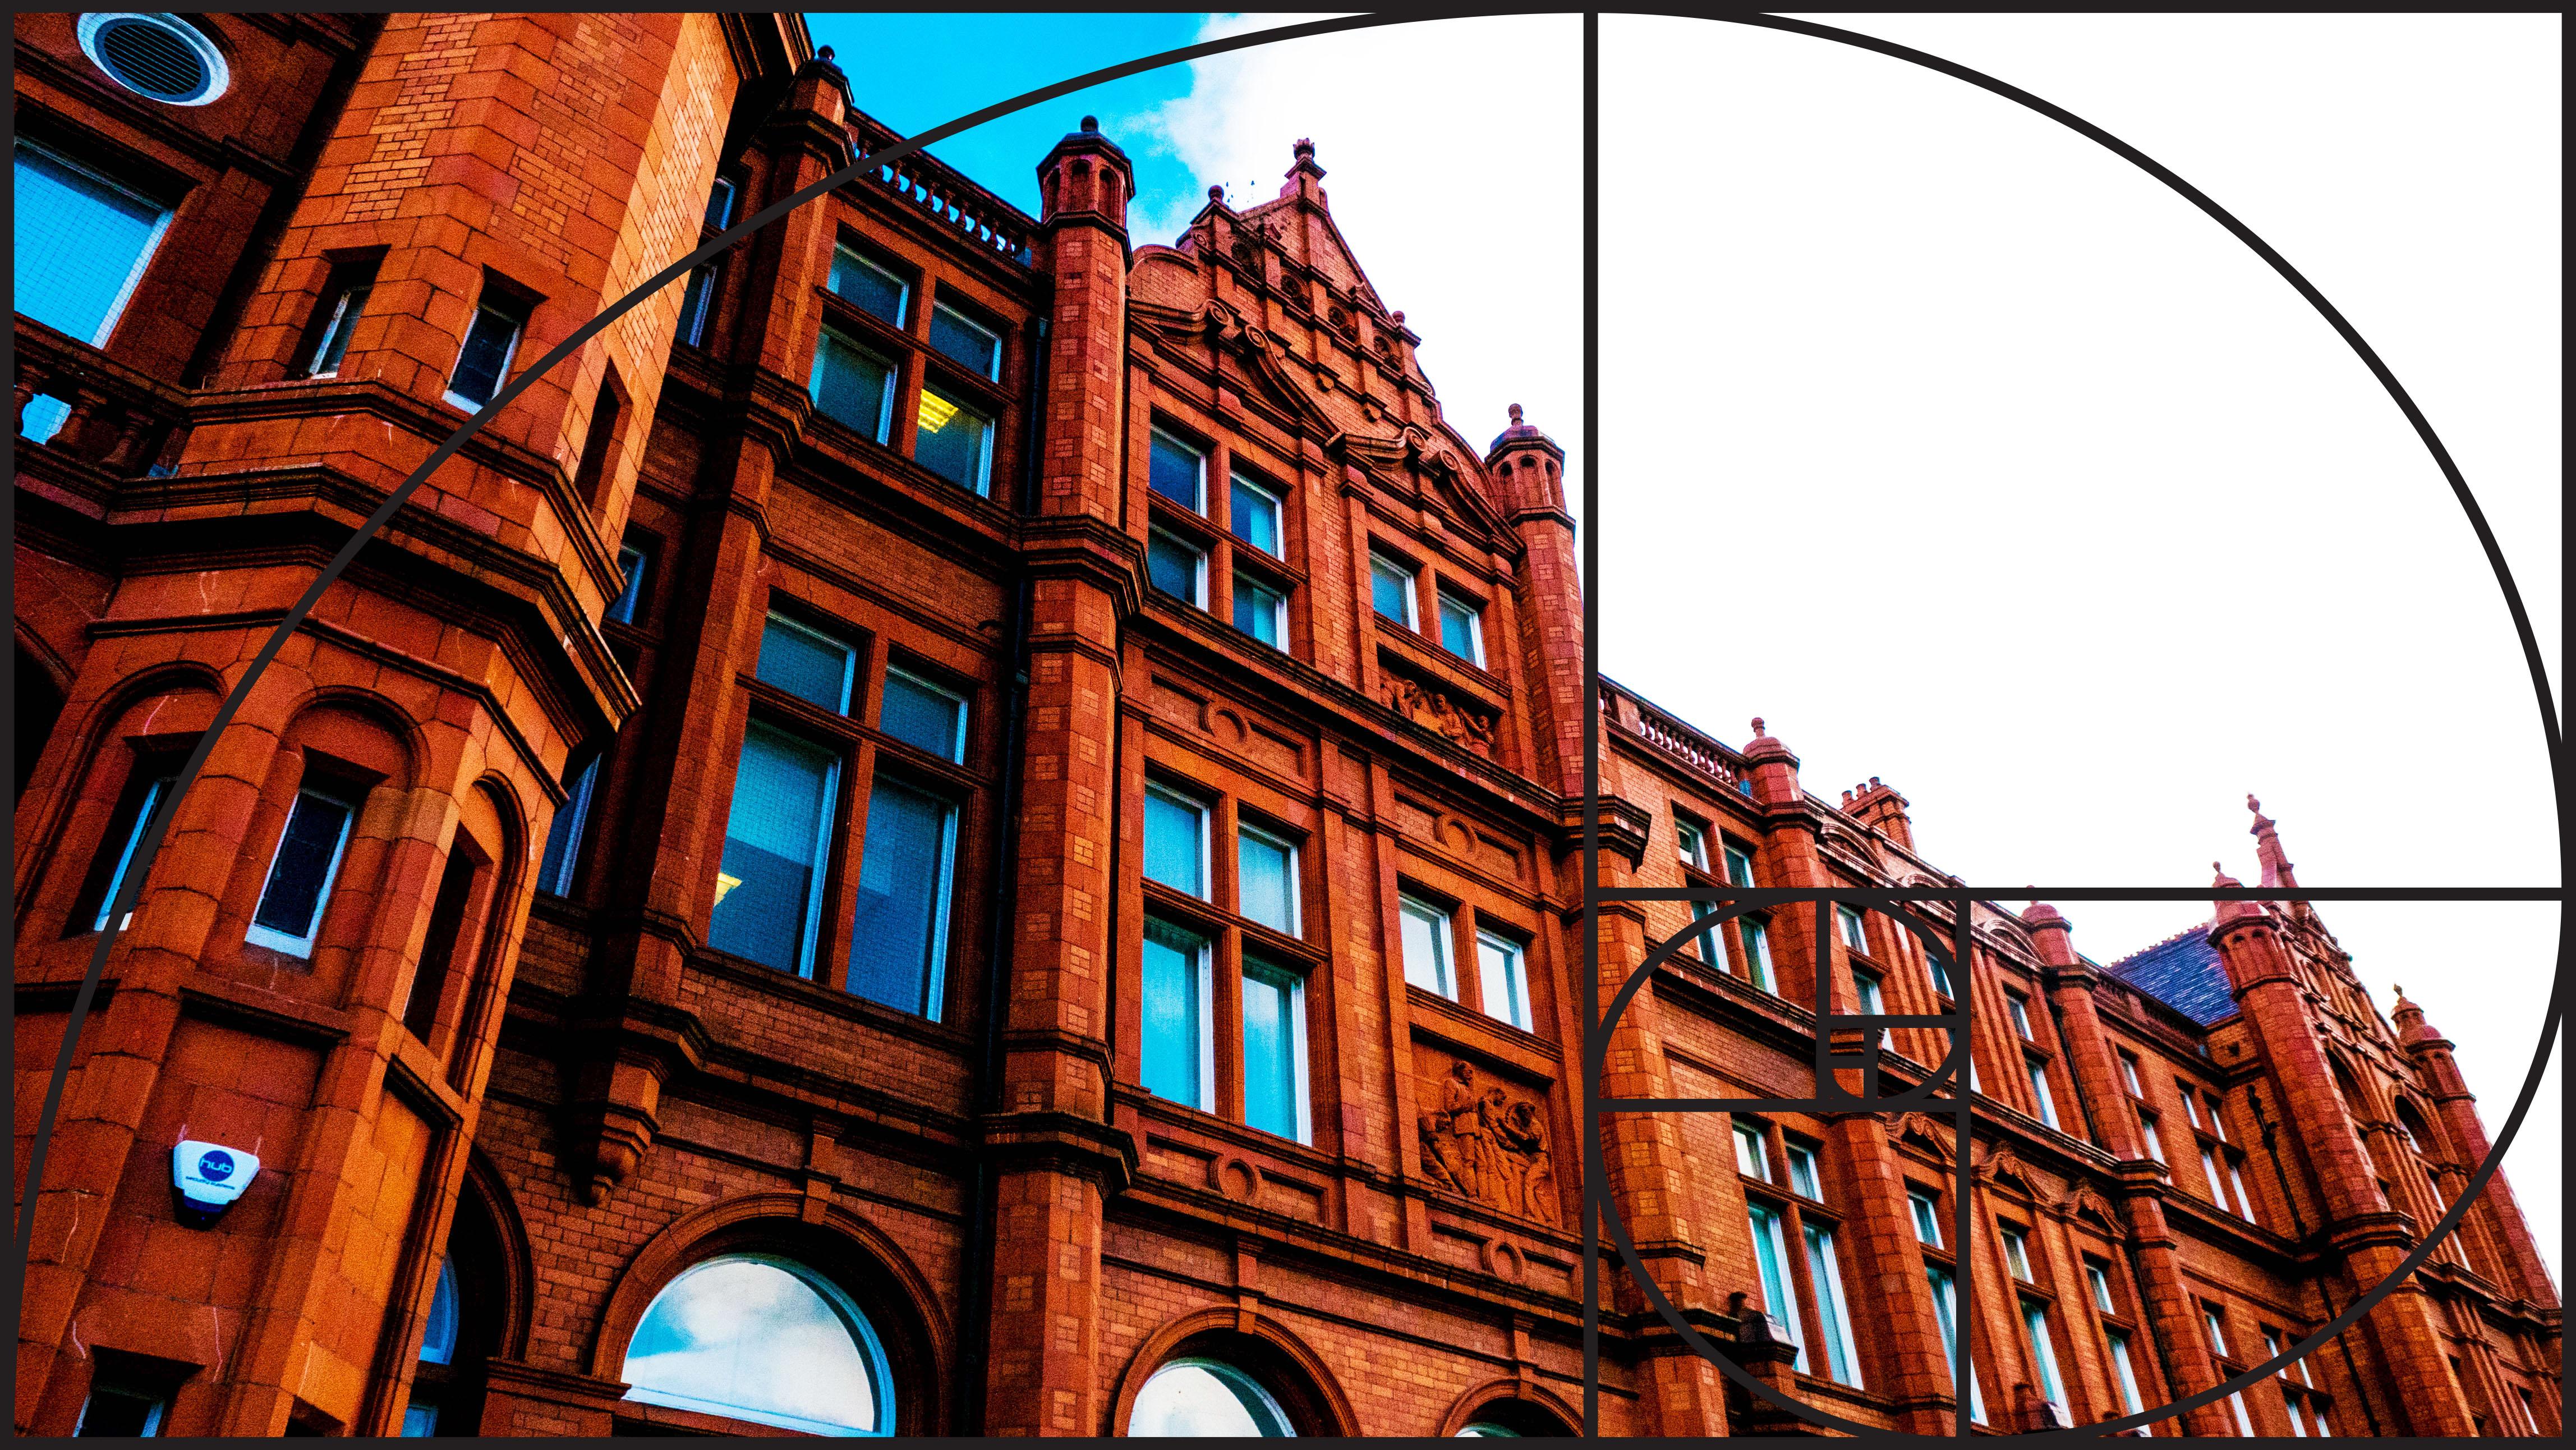 Image: Peel Building with Fibonacci Spiral template